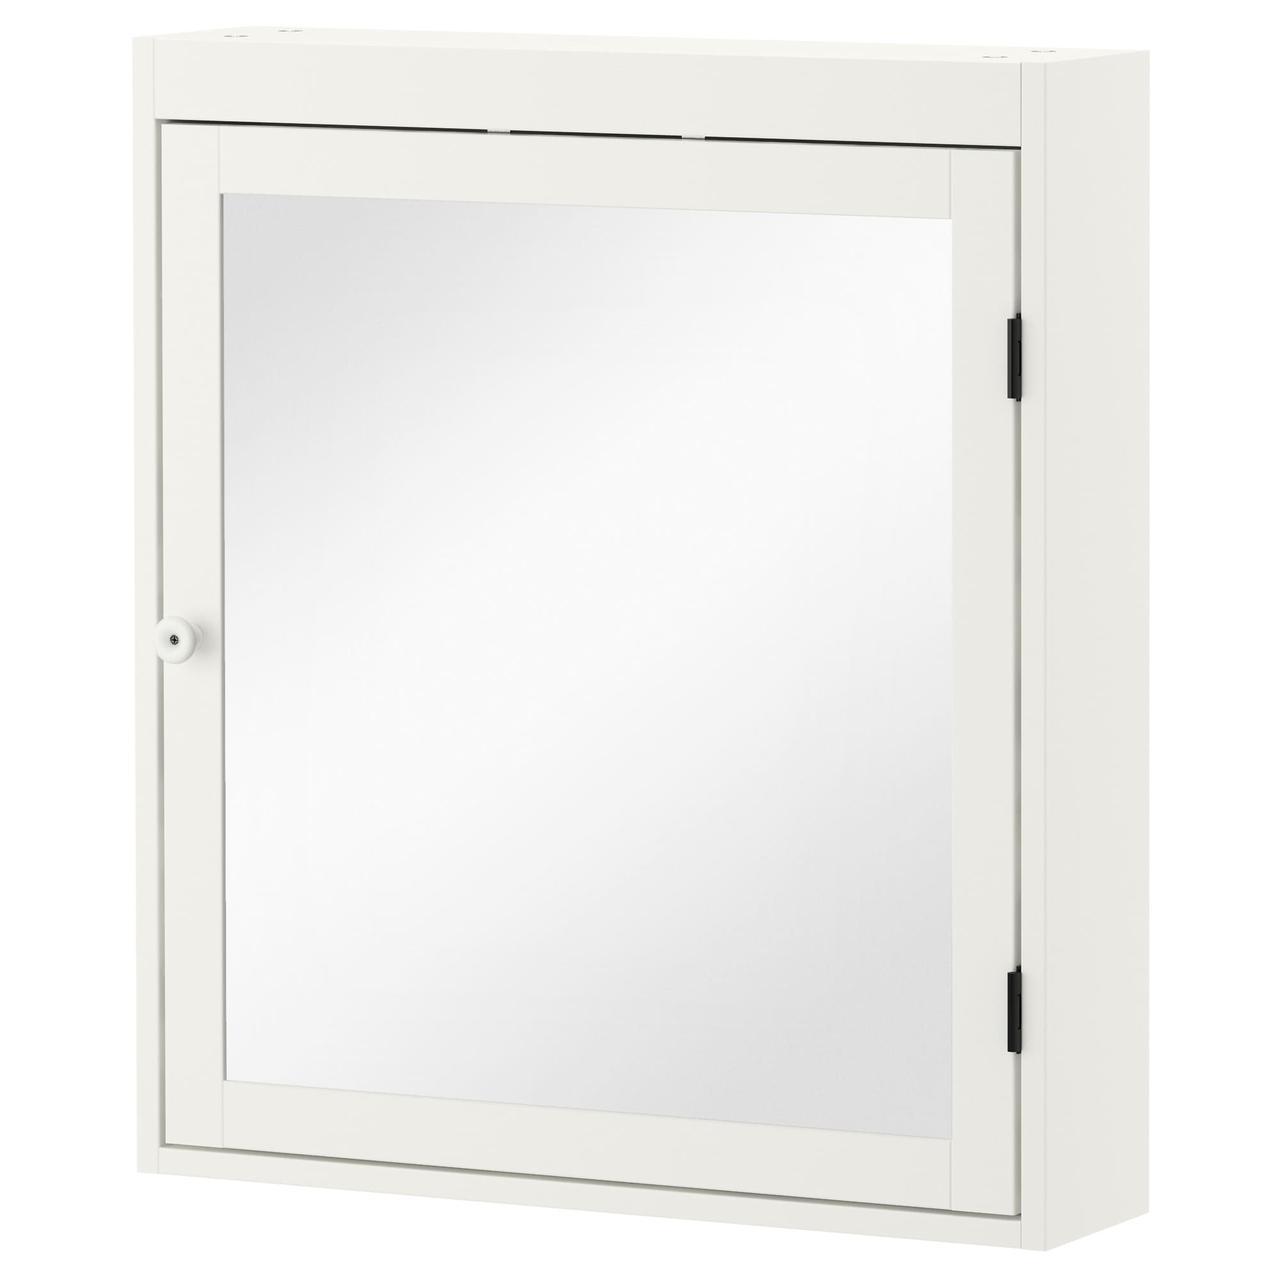 СИЛВЕРОН, Шкафчик зеркальный